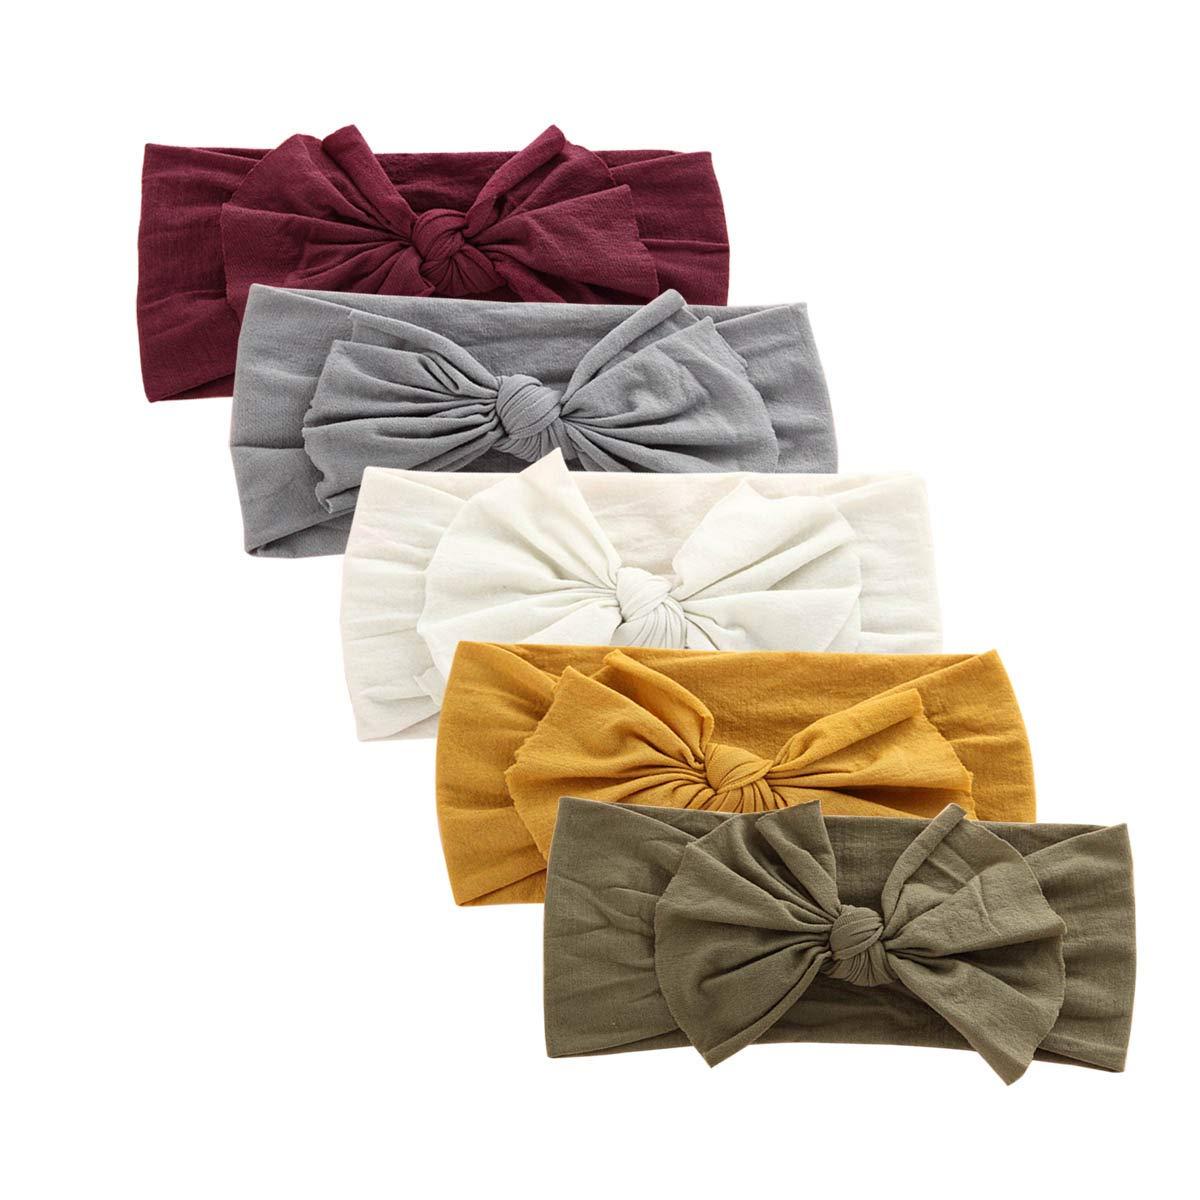 Nylon Newborn Headbands Baby Girl Bow Headband Infant Bows Head Cap Hair Band (Multicolor-ZM13)